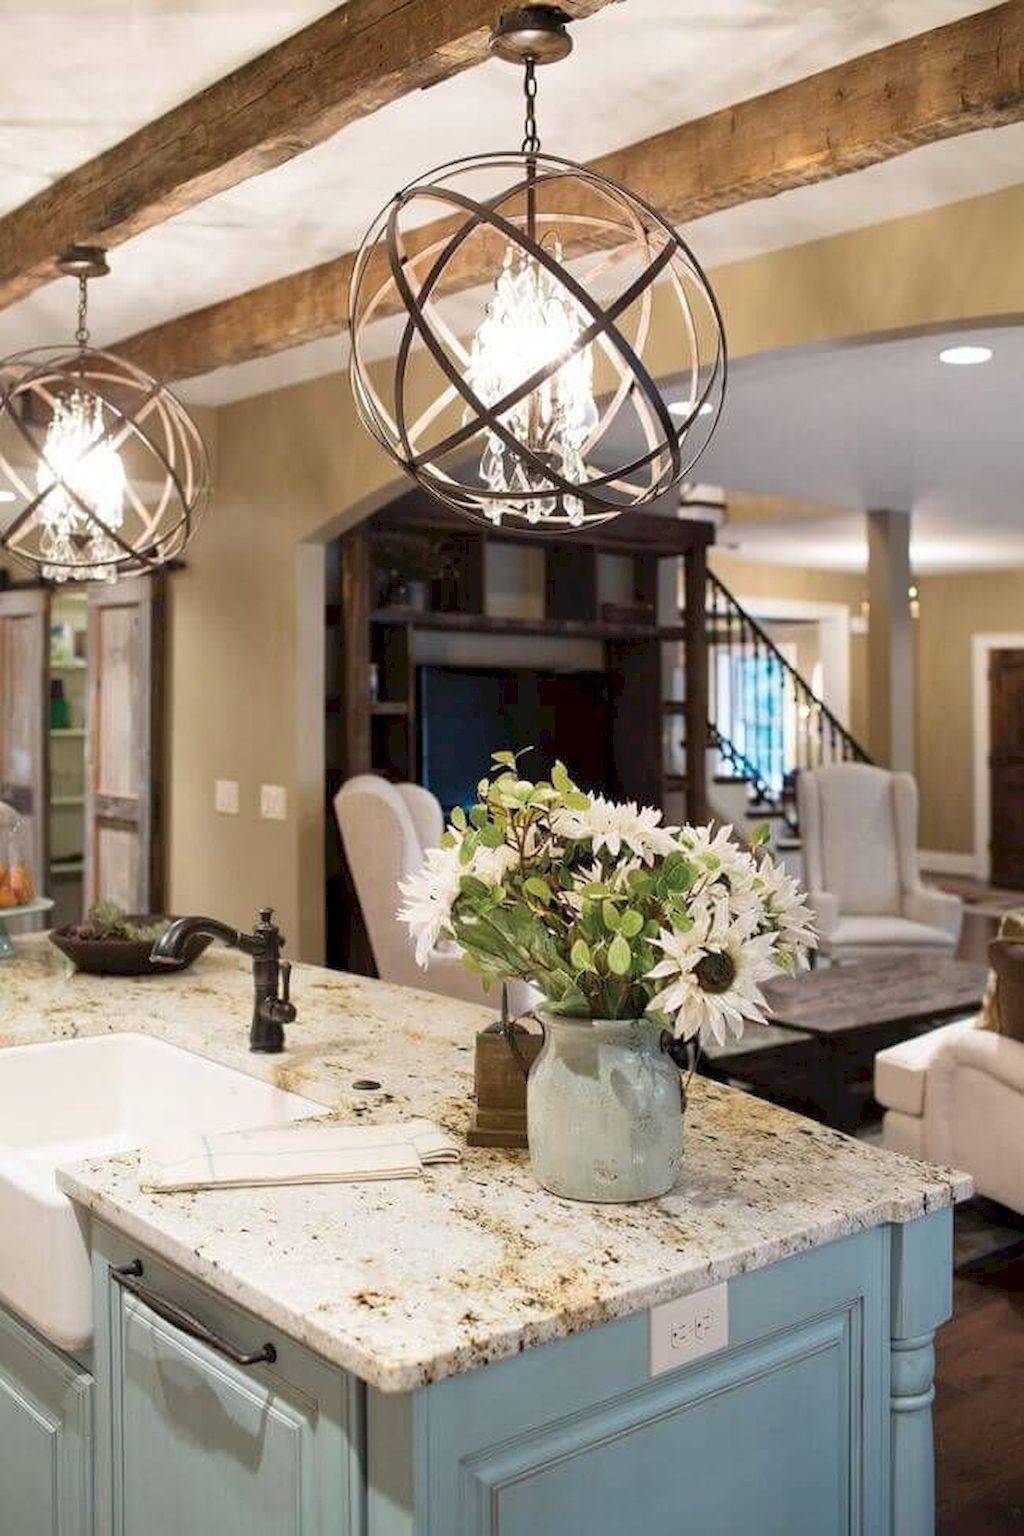 32 best ideas to decorating a farmhouse kitchen kitchen